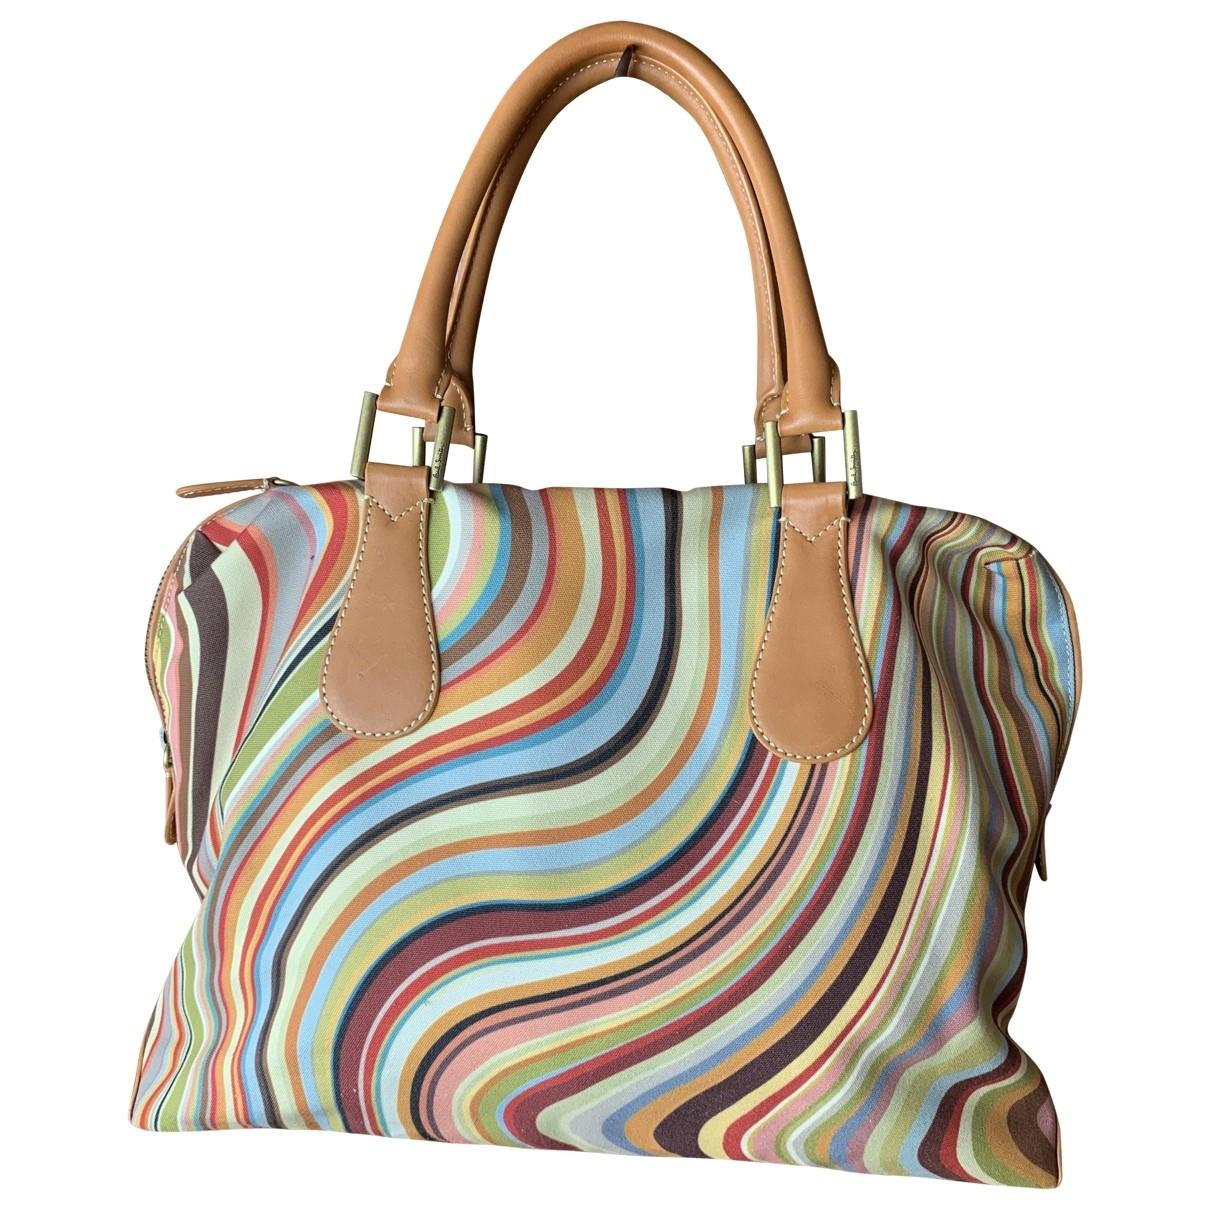 Paul Smith \N Multicolour Cloth handbag for Women \N